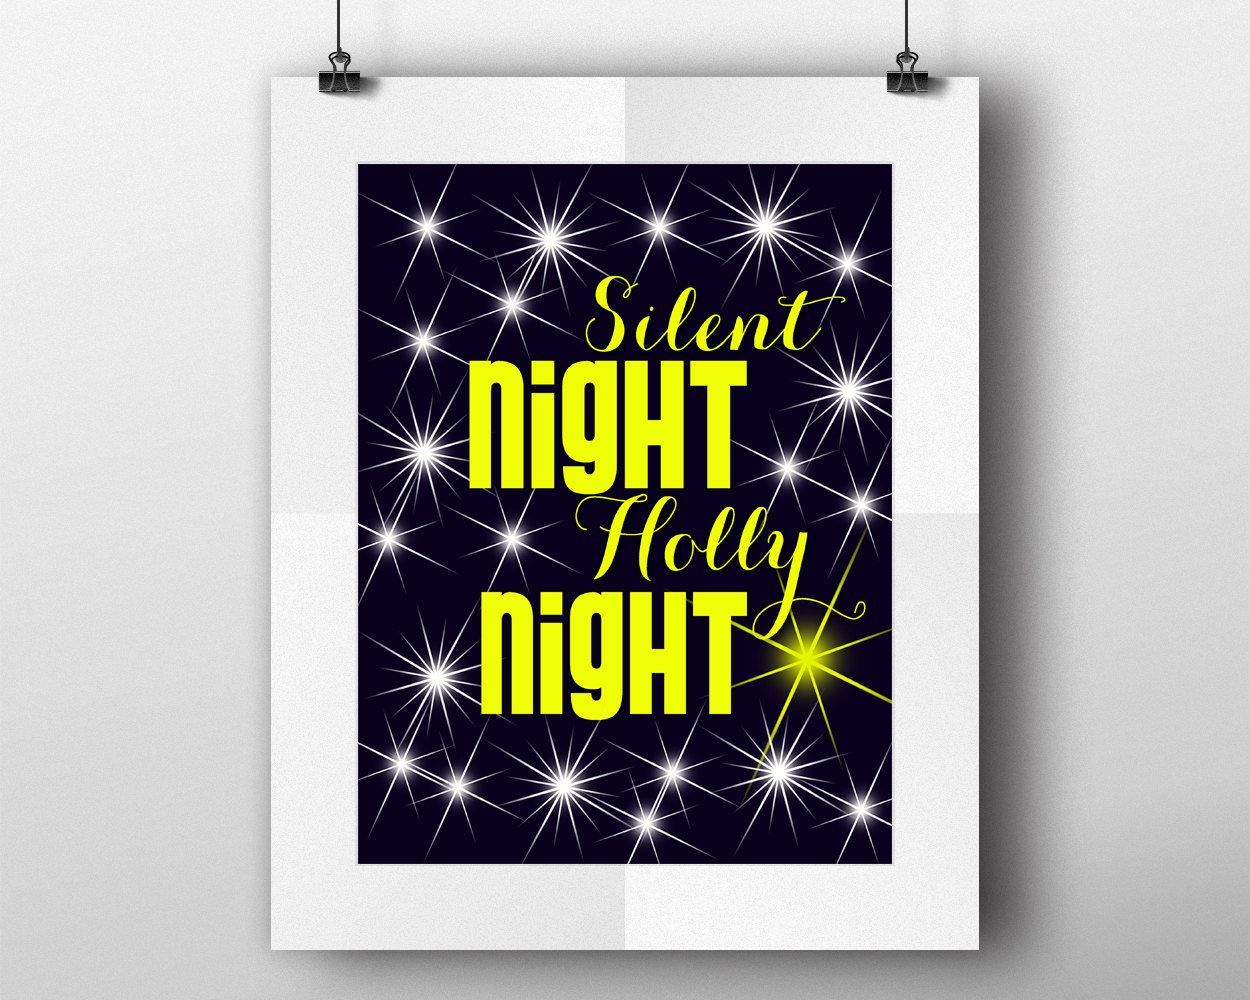 Wall Art Silent Night Holly Night Digital Print Silent Night Holly Night Poster Art Silent Night Holly Night Wall Art Print Silent Night - Digital Download #homedecorations #wallprints #giftforhim #giftforher